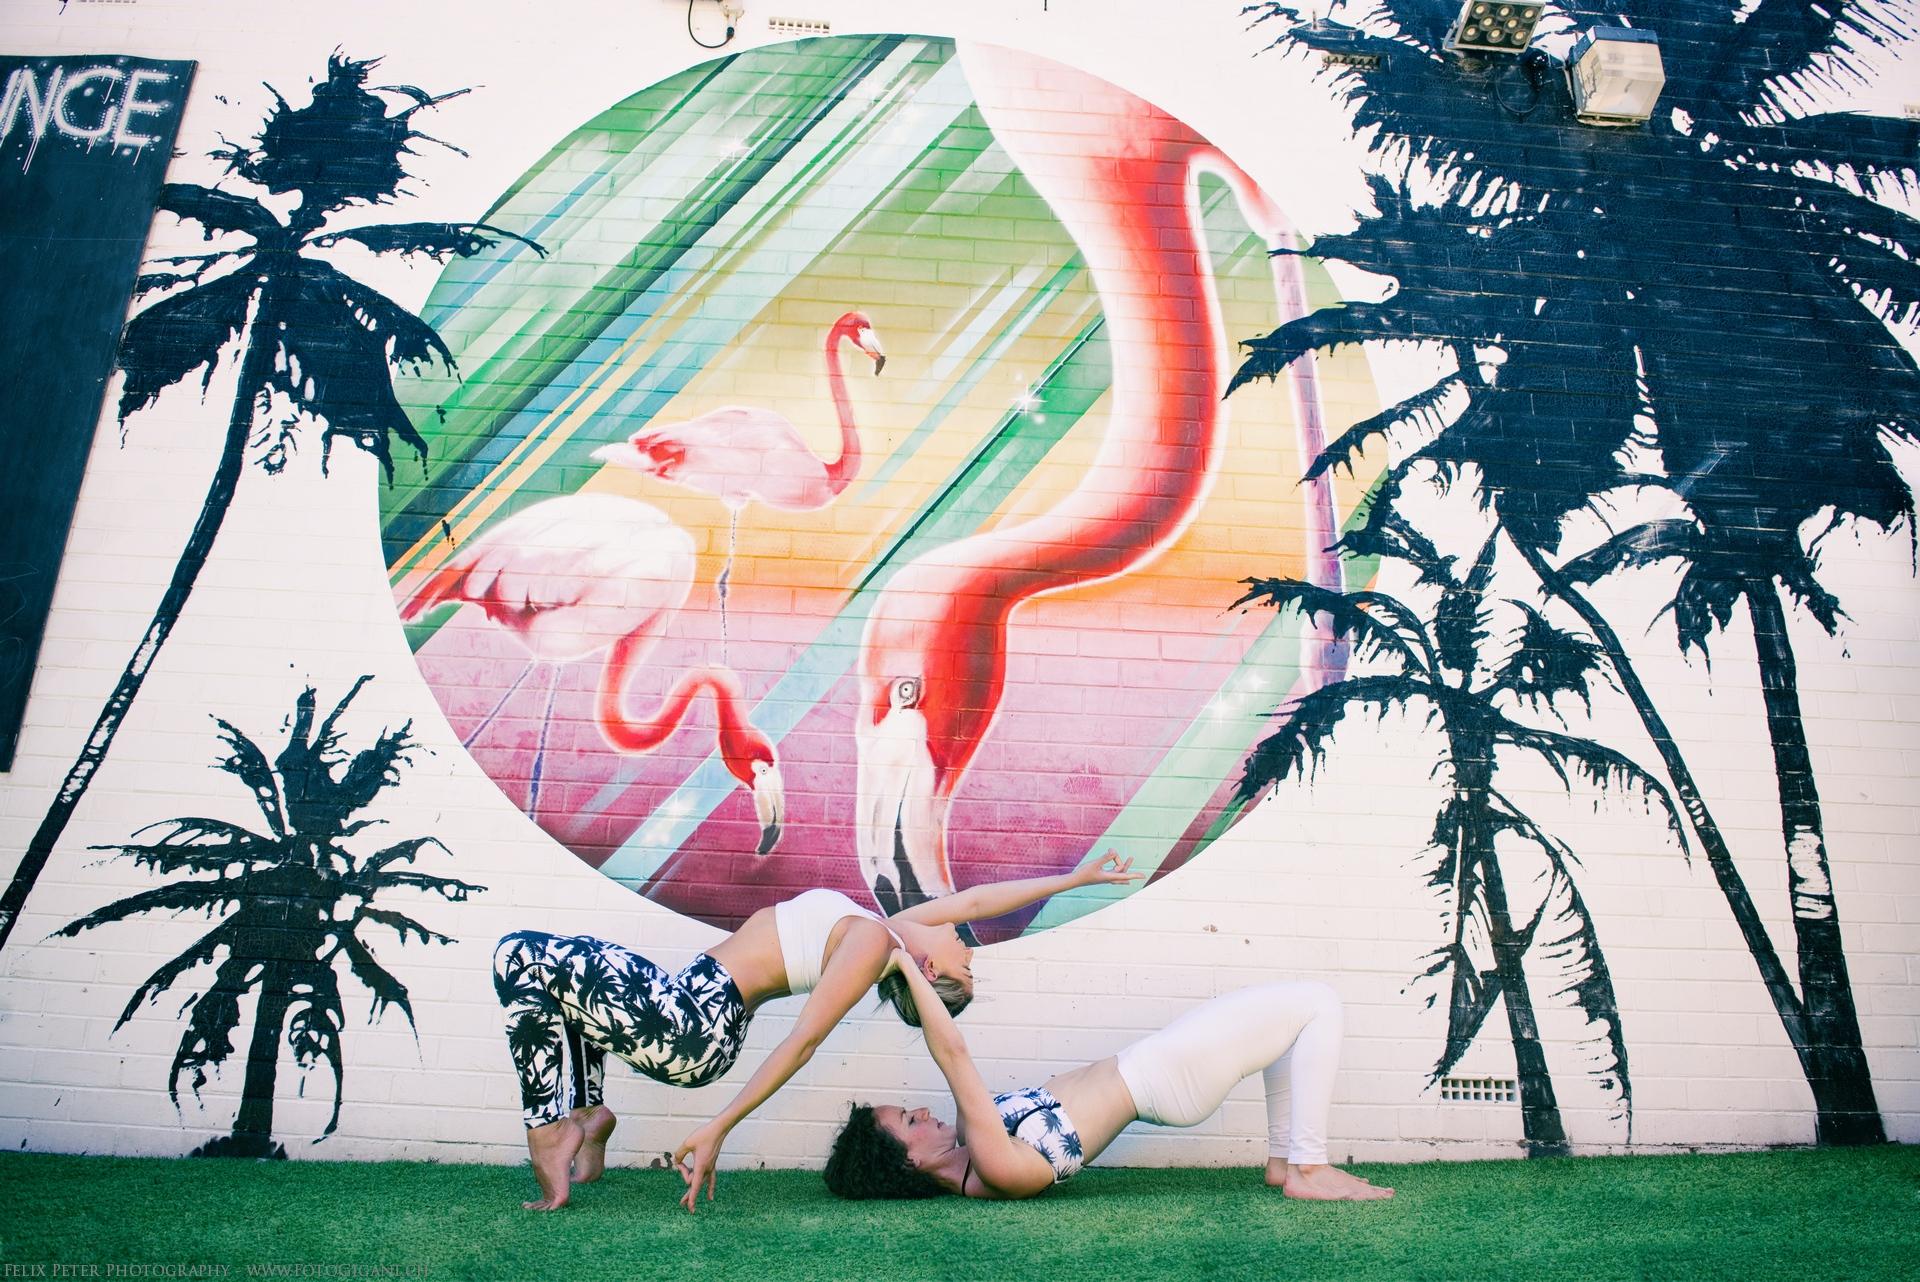 Felix-Peter-Yoga-Pilates-Dance-Fotografie_Bern_107.jpg